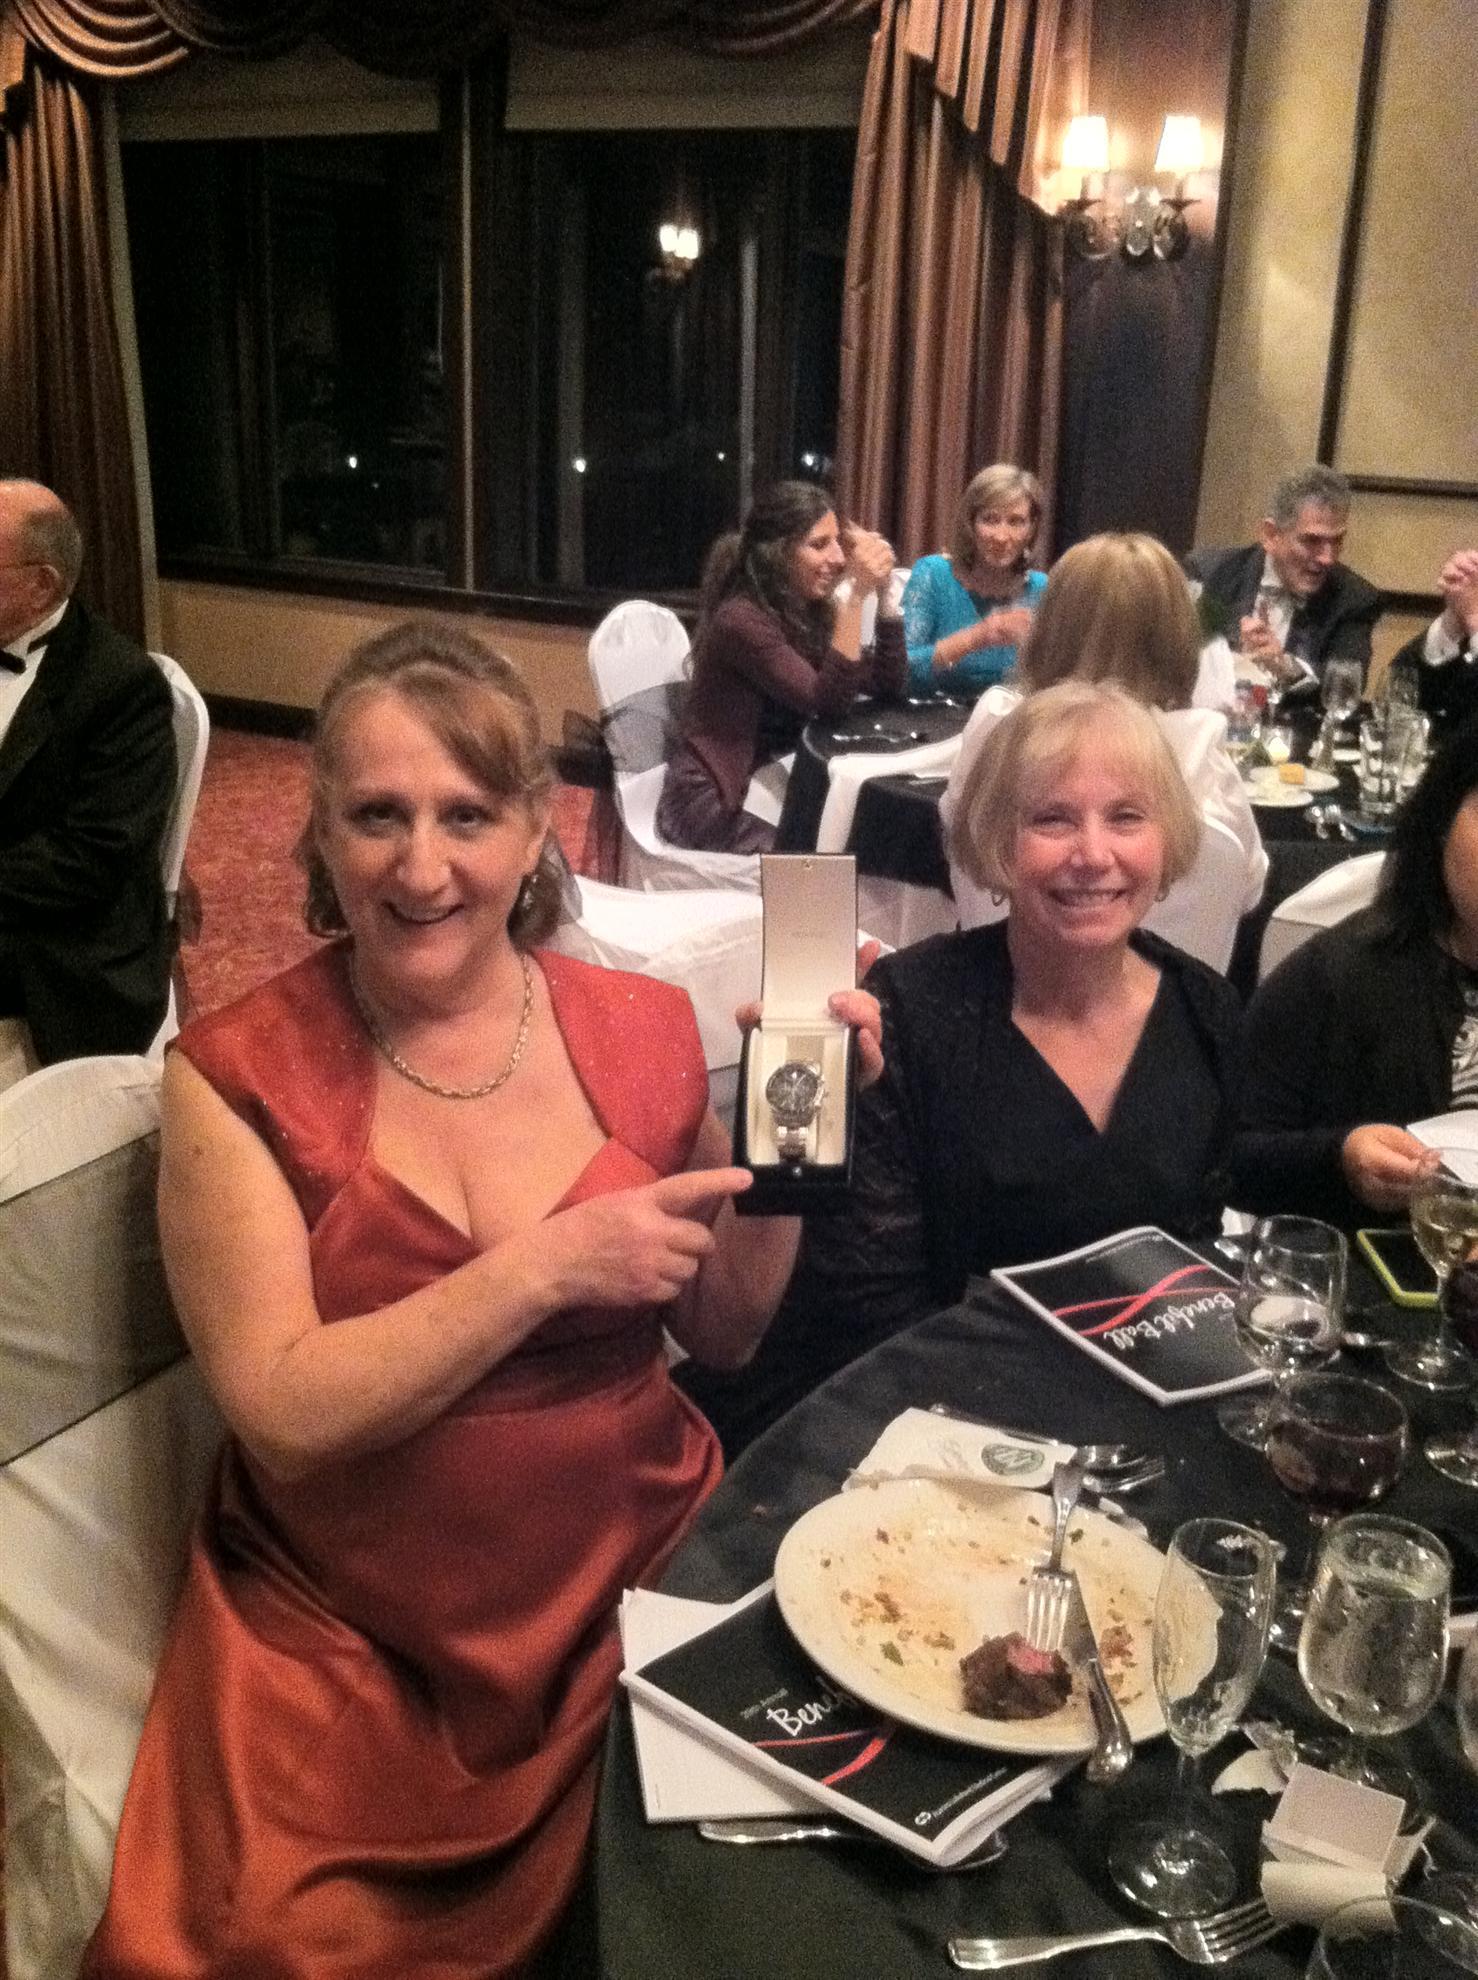 Marilyn Cayo and Denise Pieroni Attend Lakeland Benefit Ball